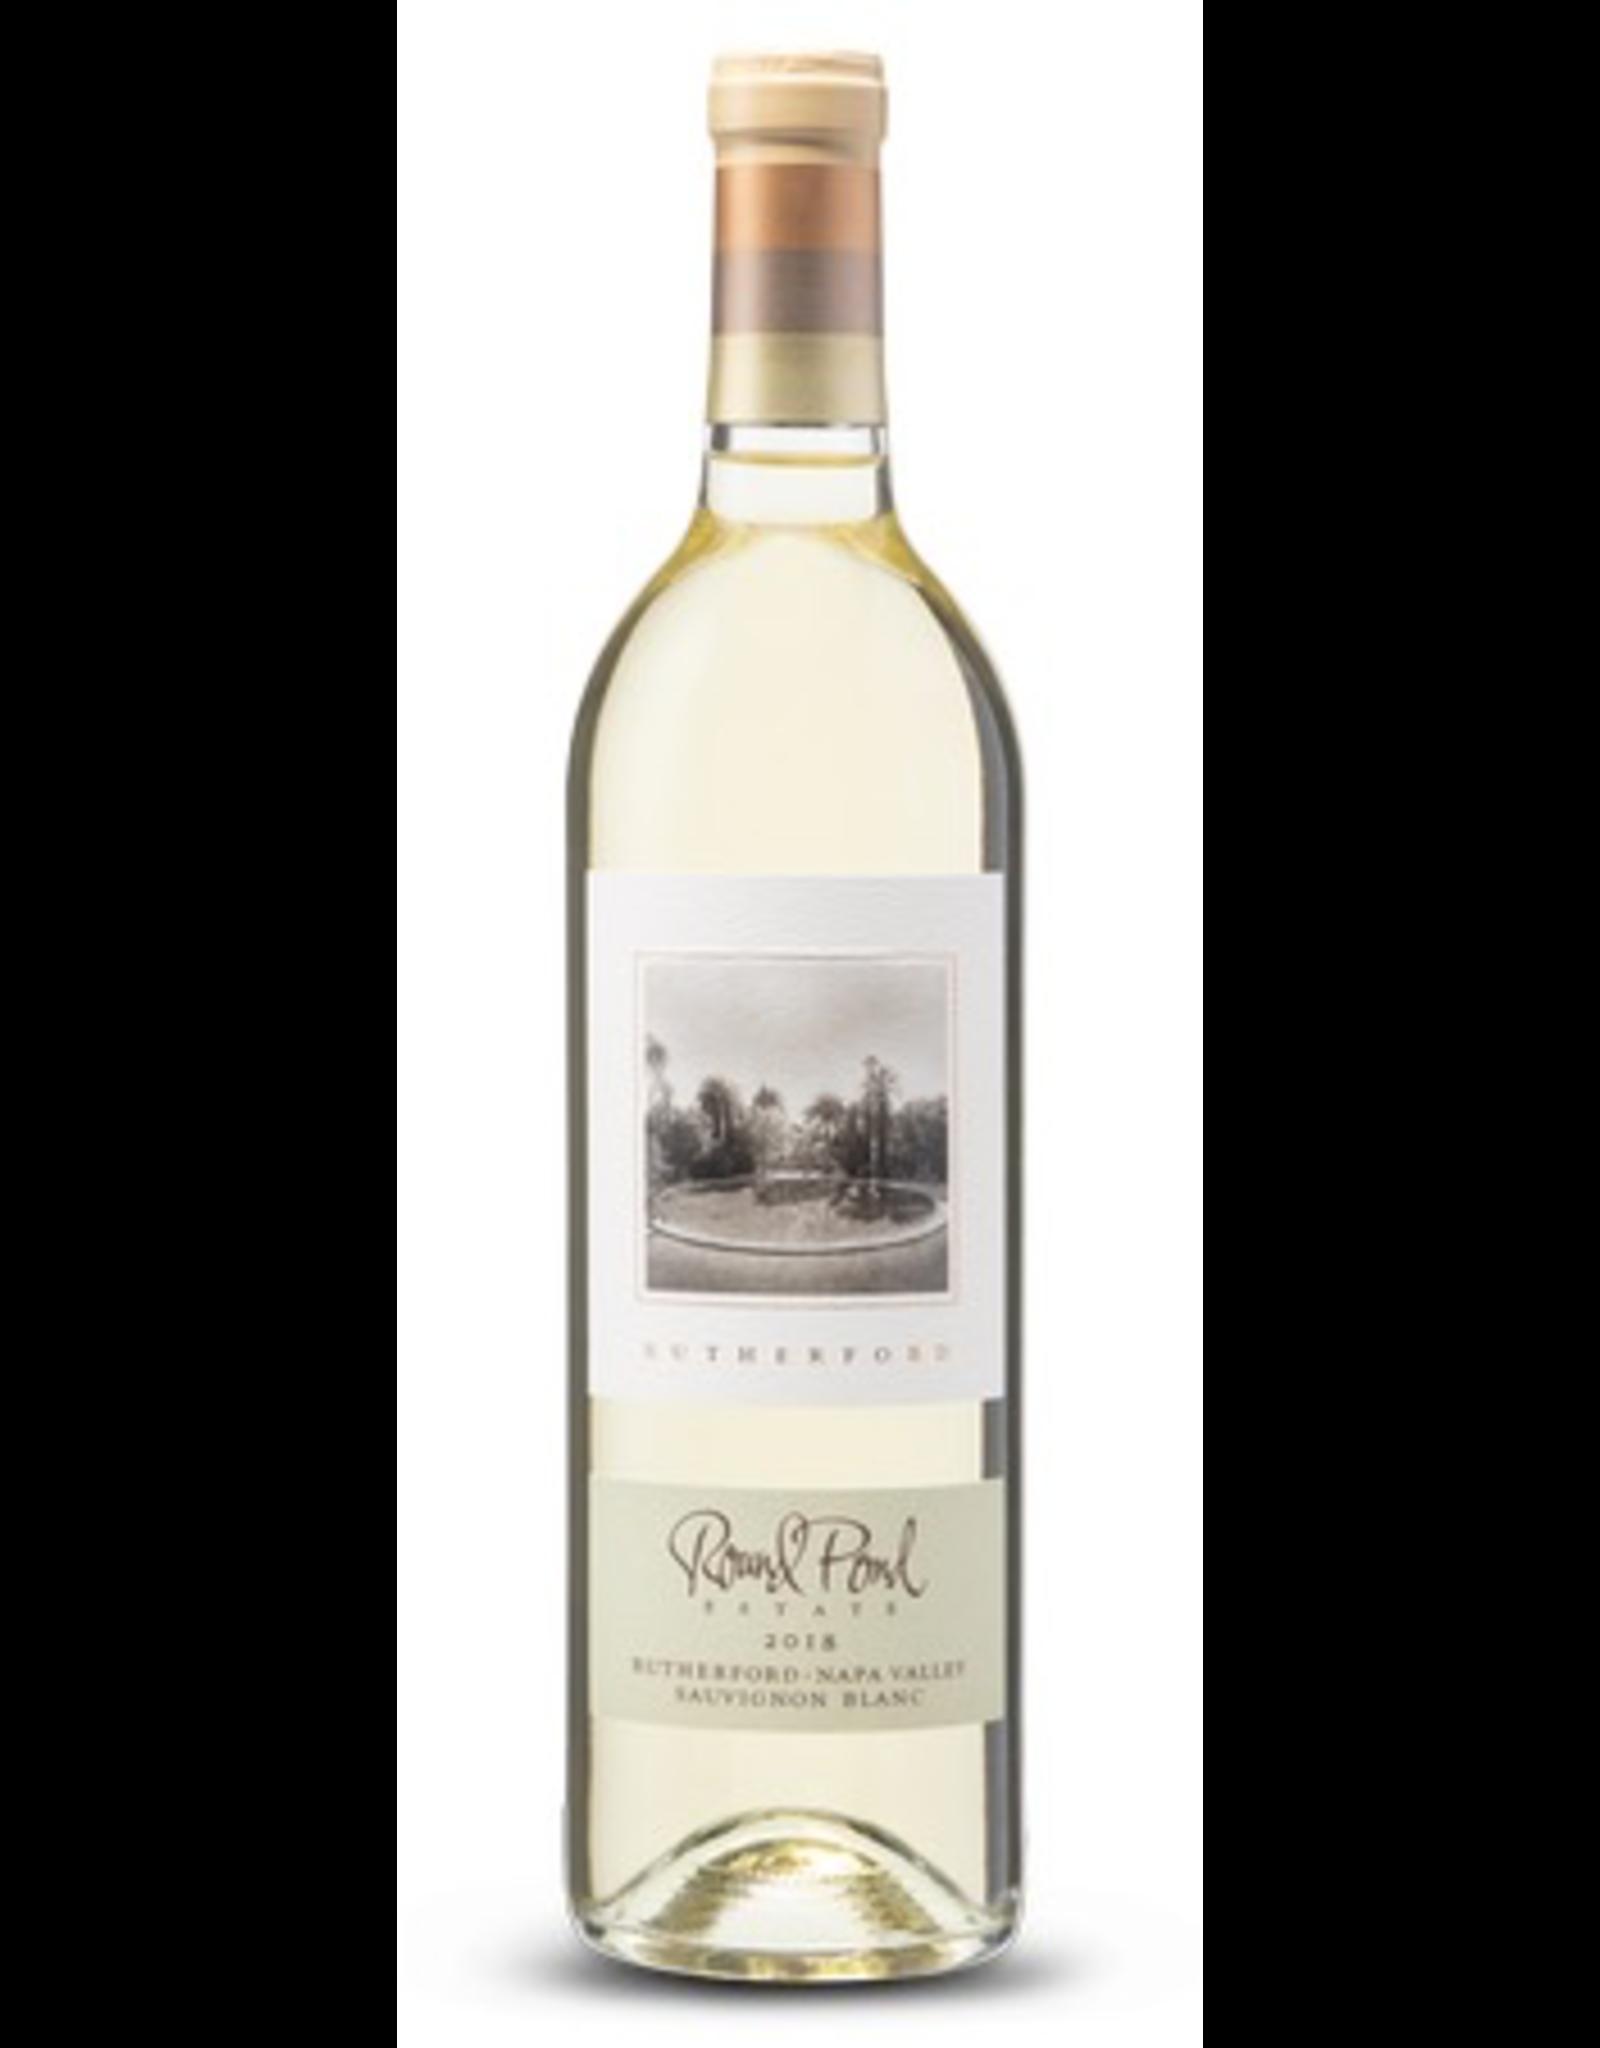 White Wine 2018, Round Pond Estate, Sauvignon Blanc, Rutherford, Napa Valley, California, 14% Alc, CTnr, JS91